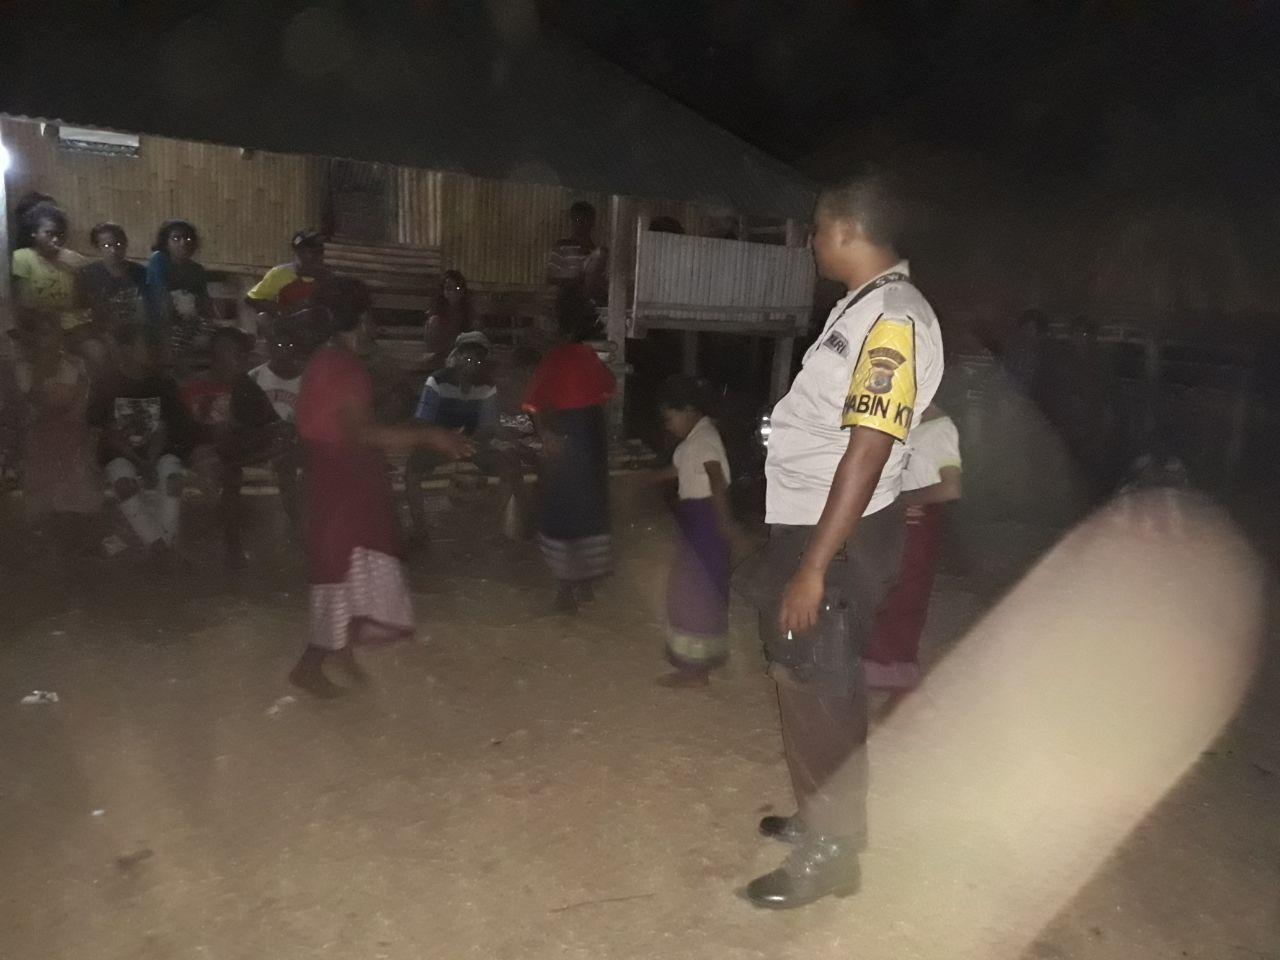 Polsek Bondo Kodi | Patroli Dan Sambang Warga Demi Situasi Kamtibmas Yang Konfusif